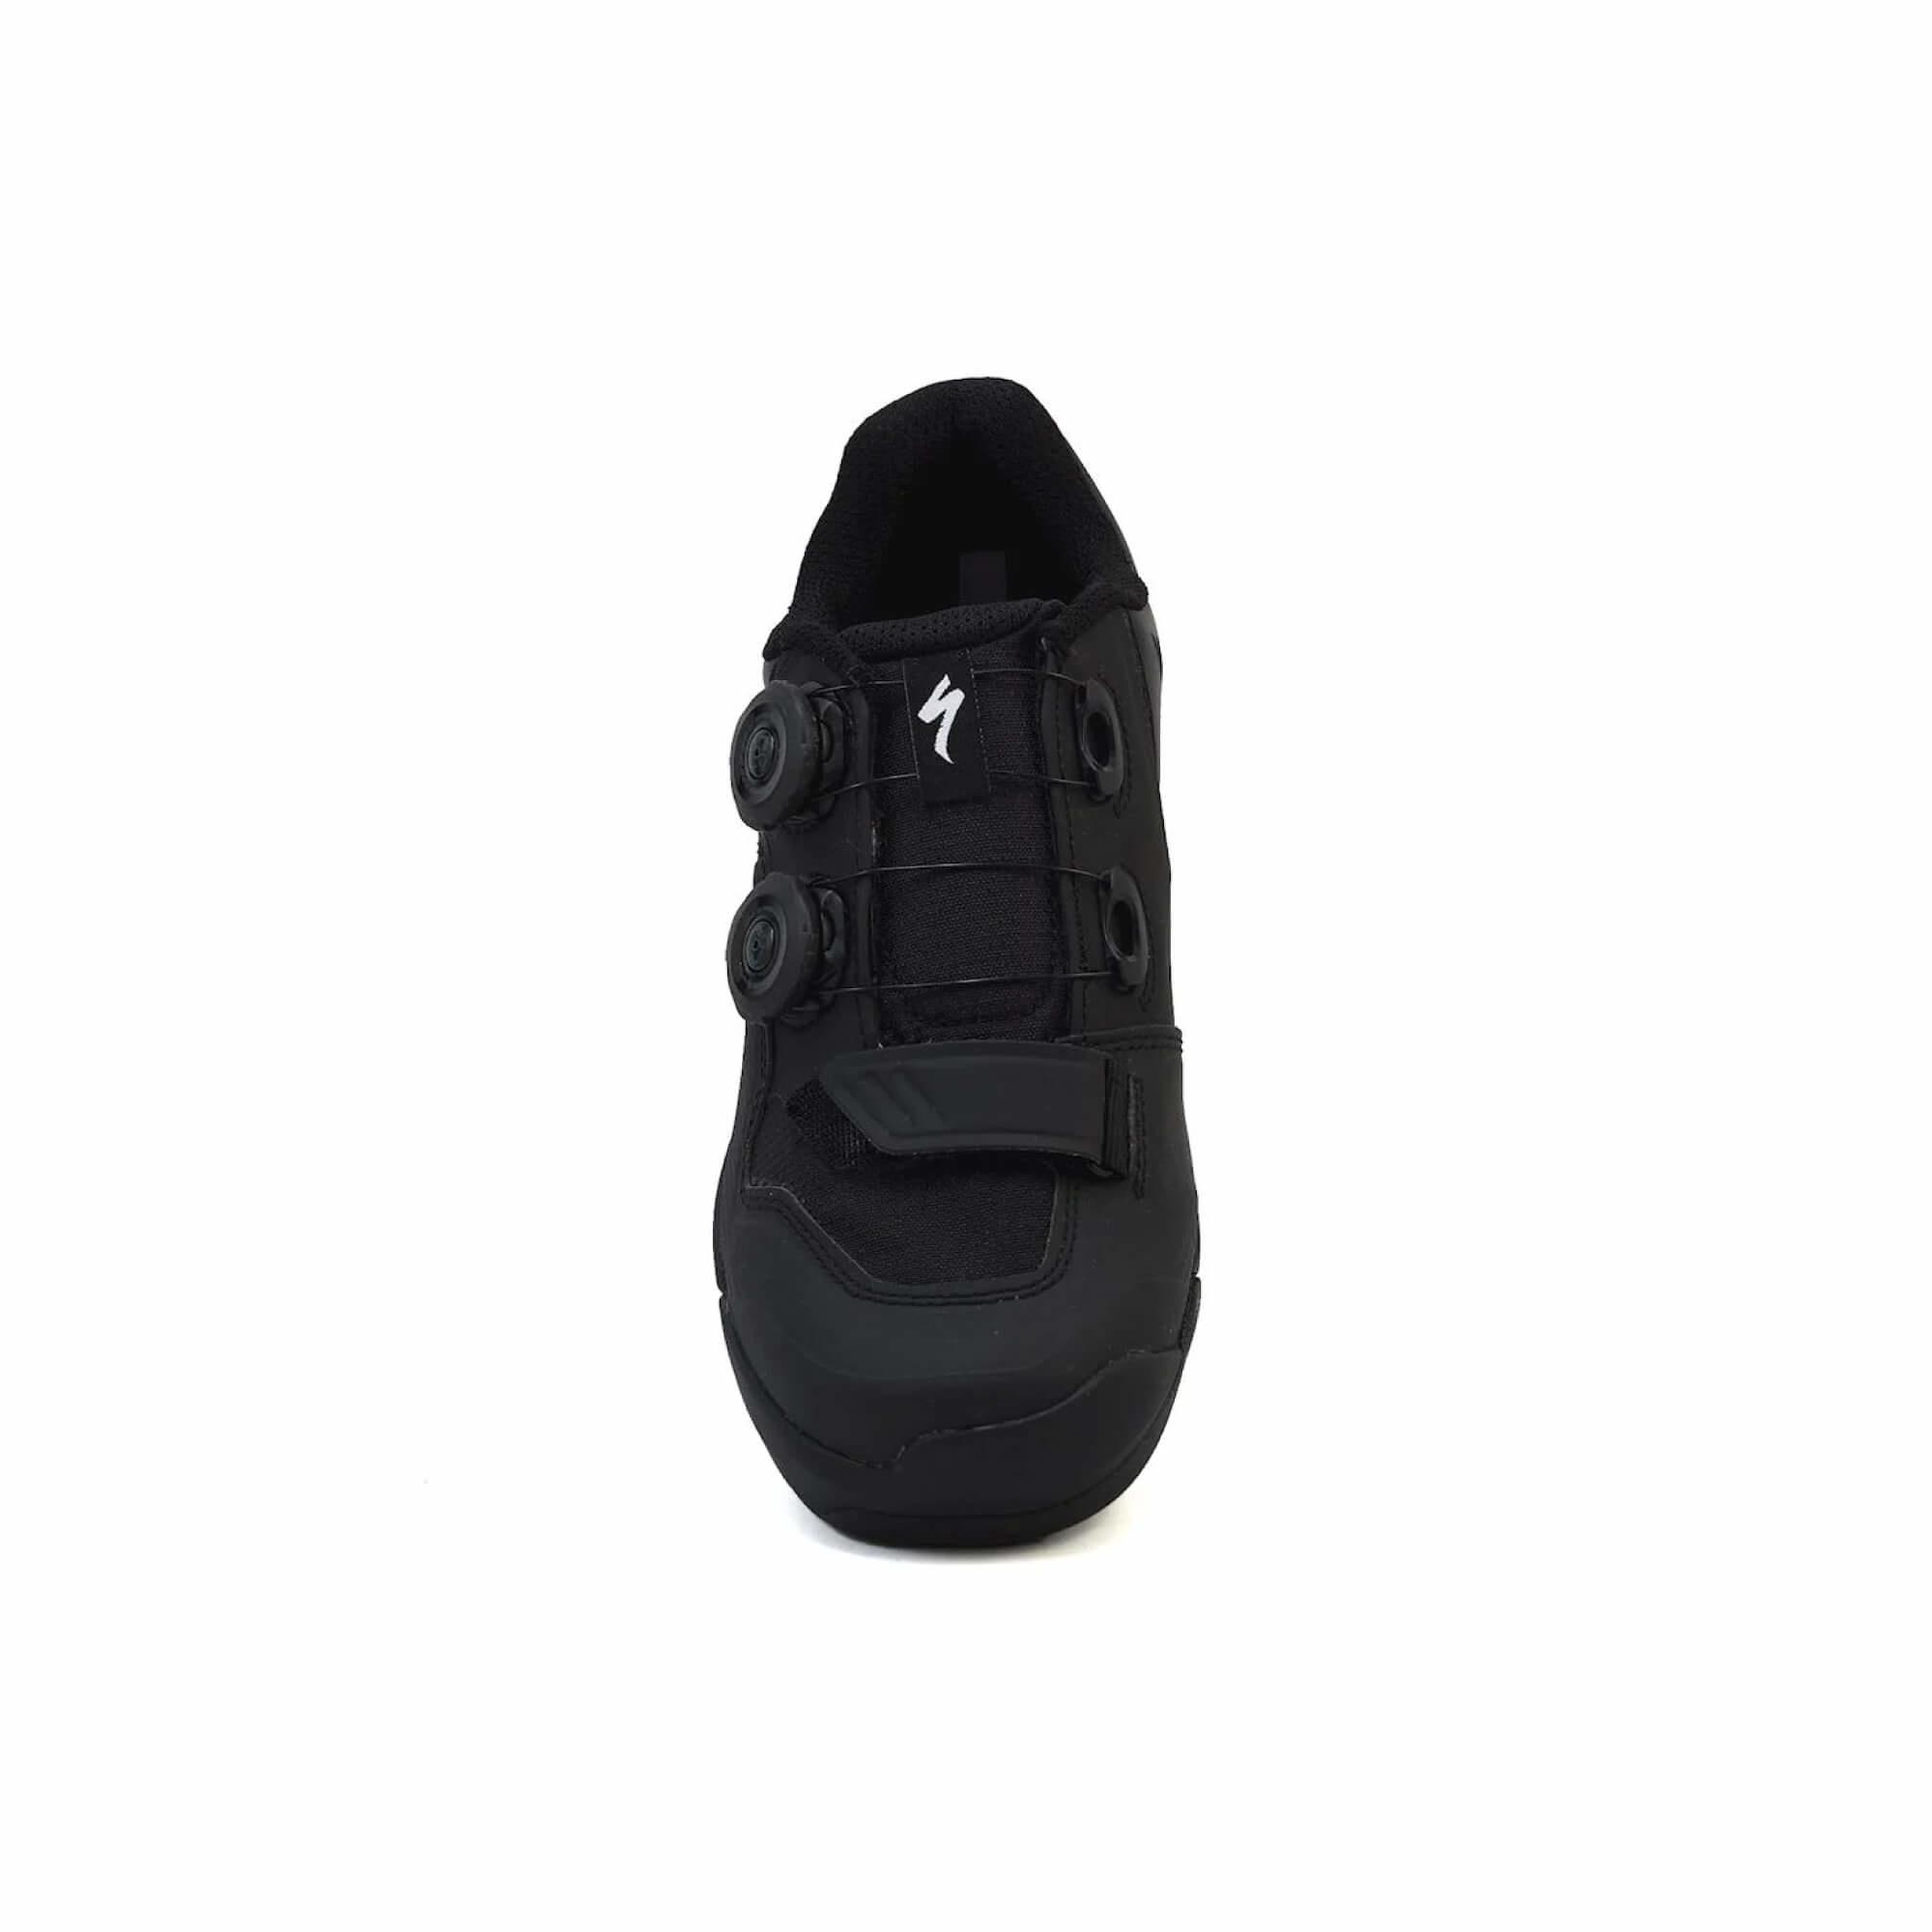 2FO Cliplite MTB Shoe 2019-3